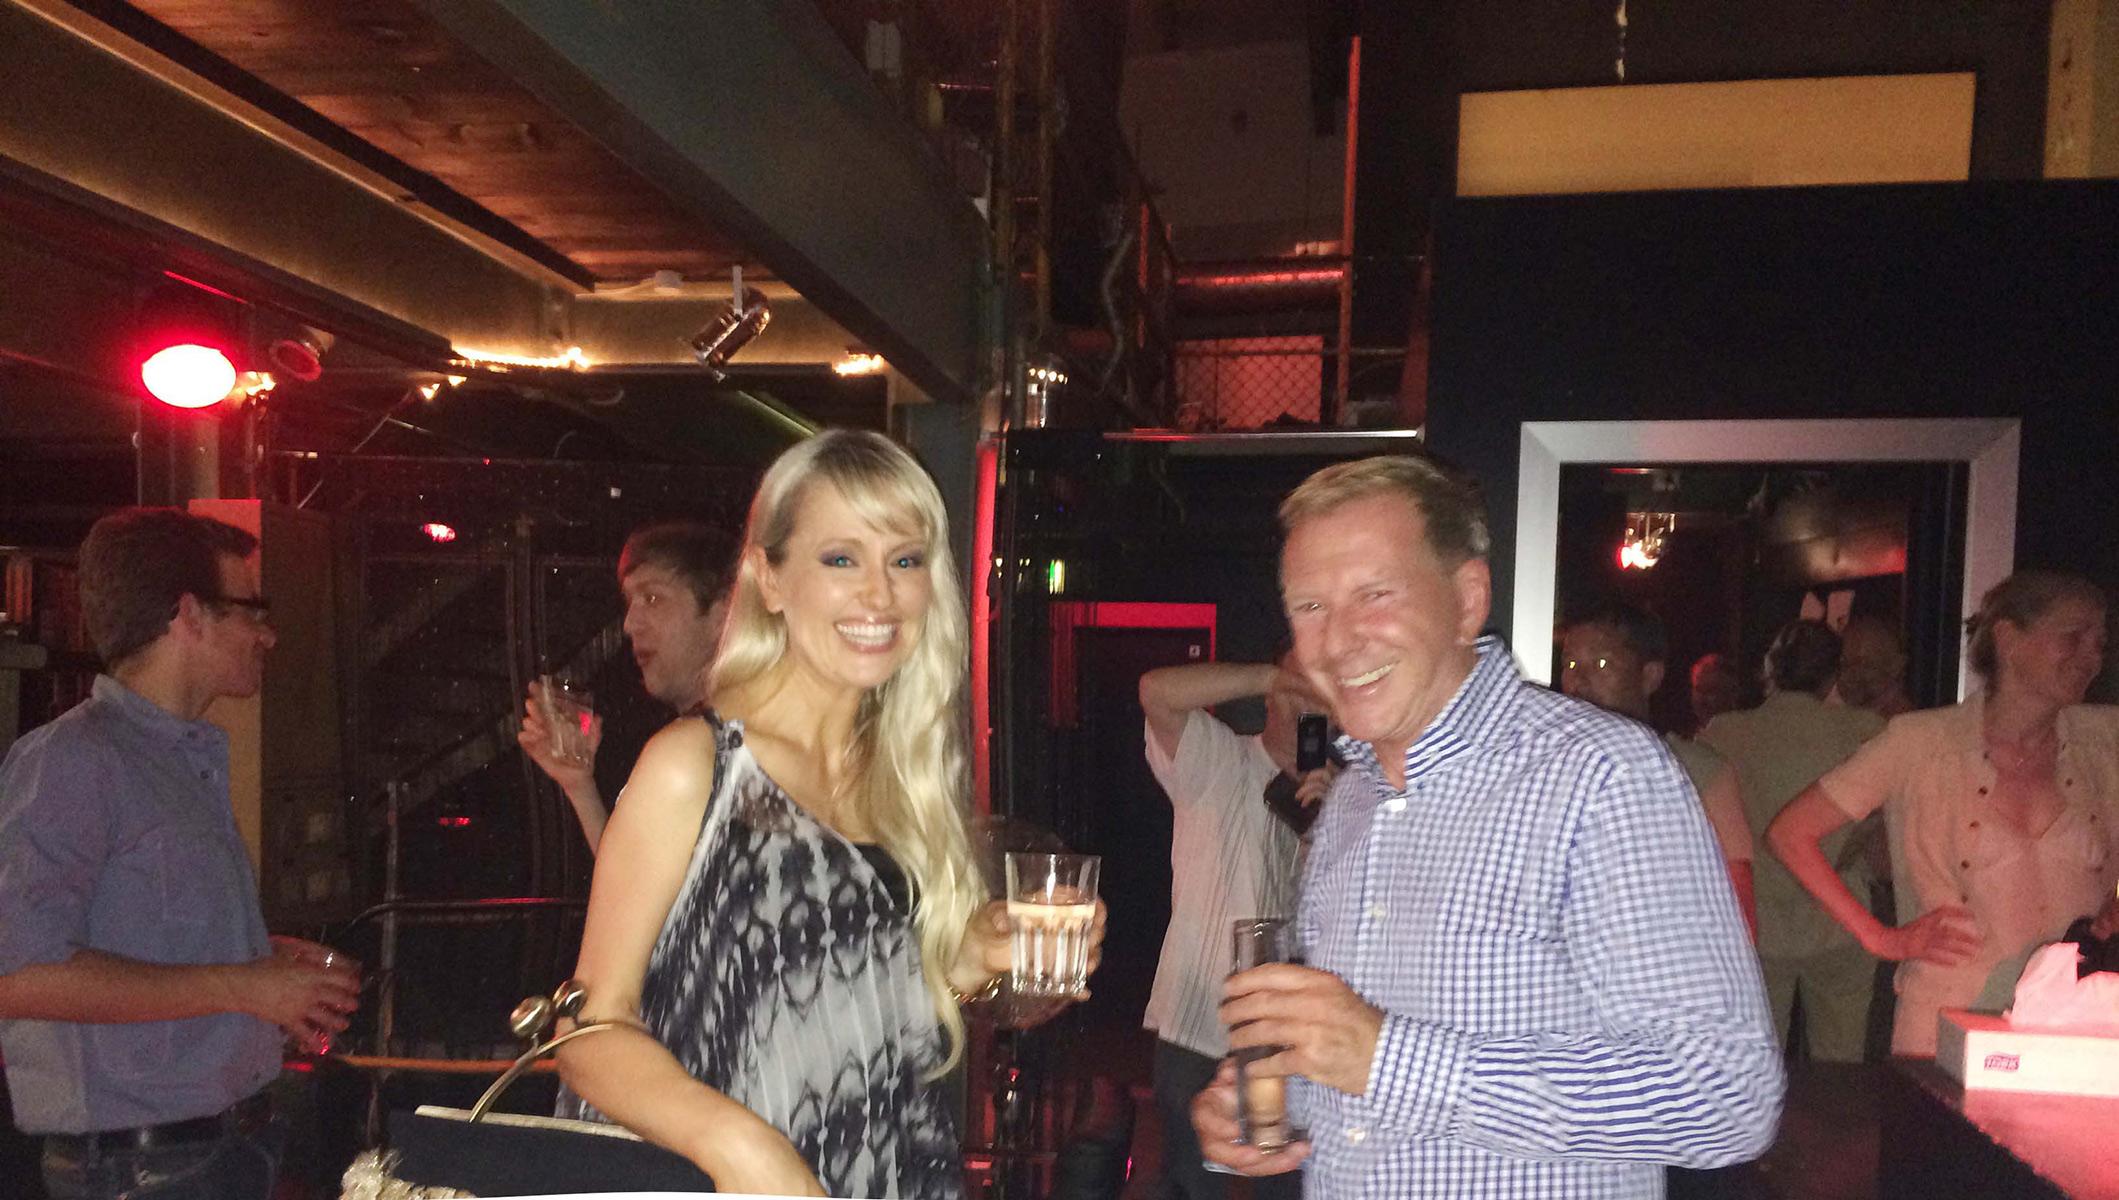 Olga-Roh-on-SRF-with-Kurt-Aeschbacher-on-12th-June-2014-(4)